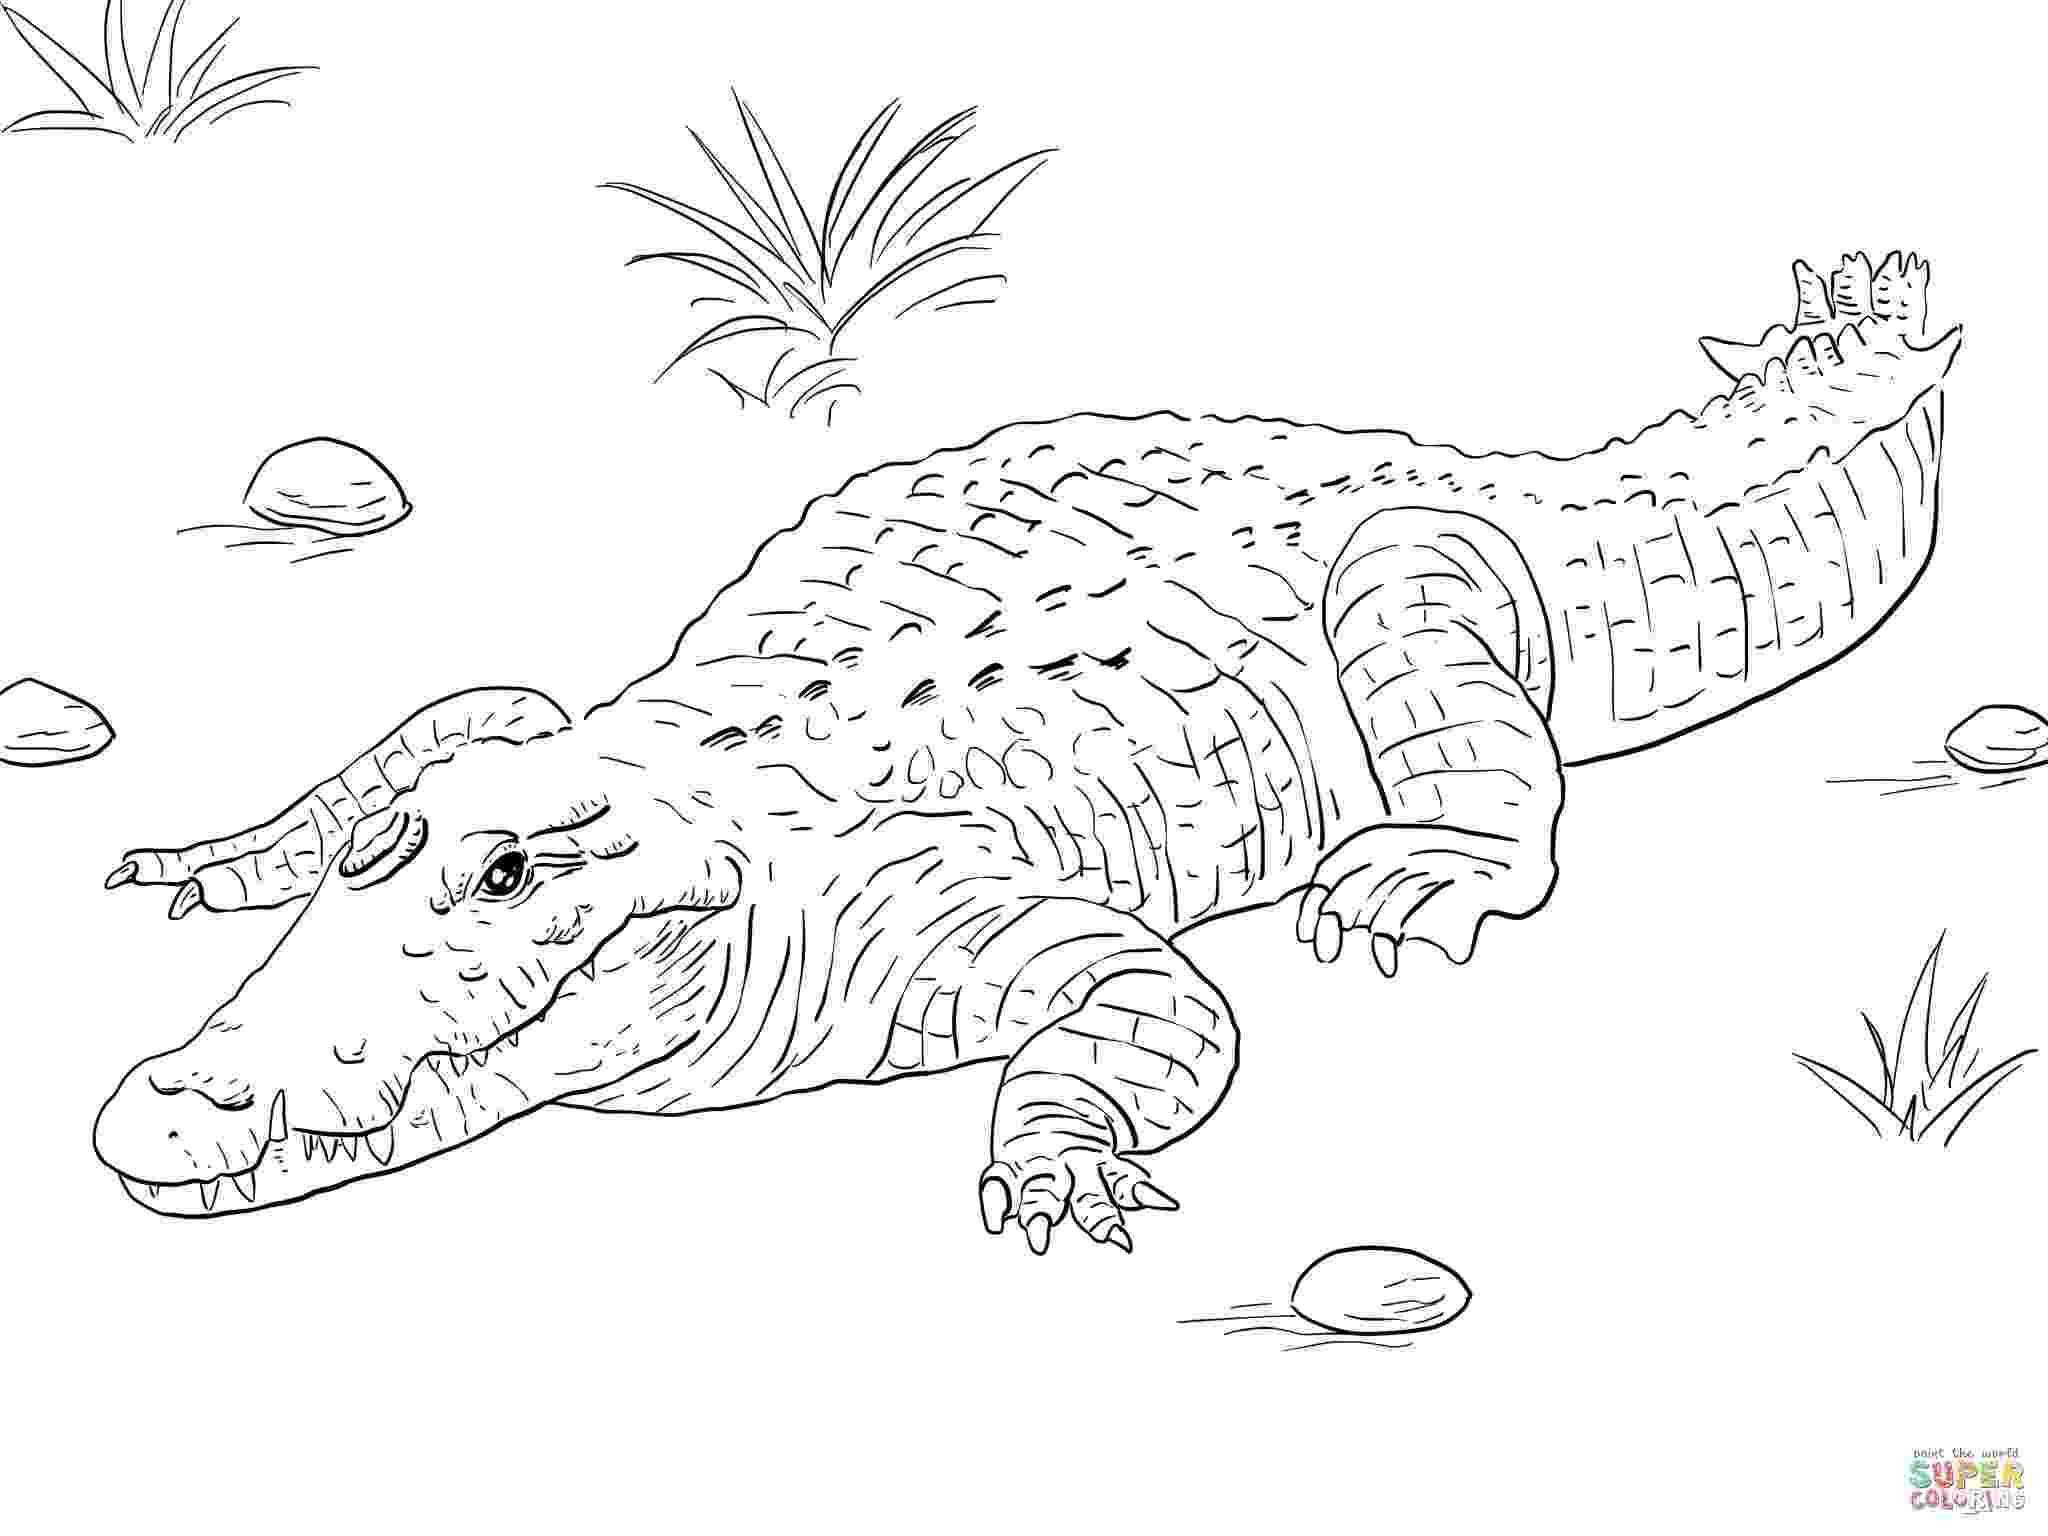 crocodile colouring page free printable crocodile coloring pages for kids colouring crocodile page